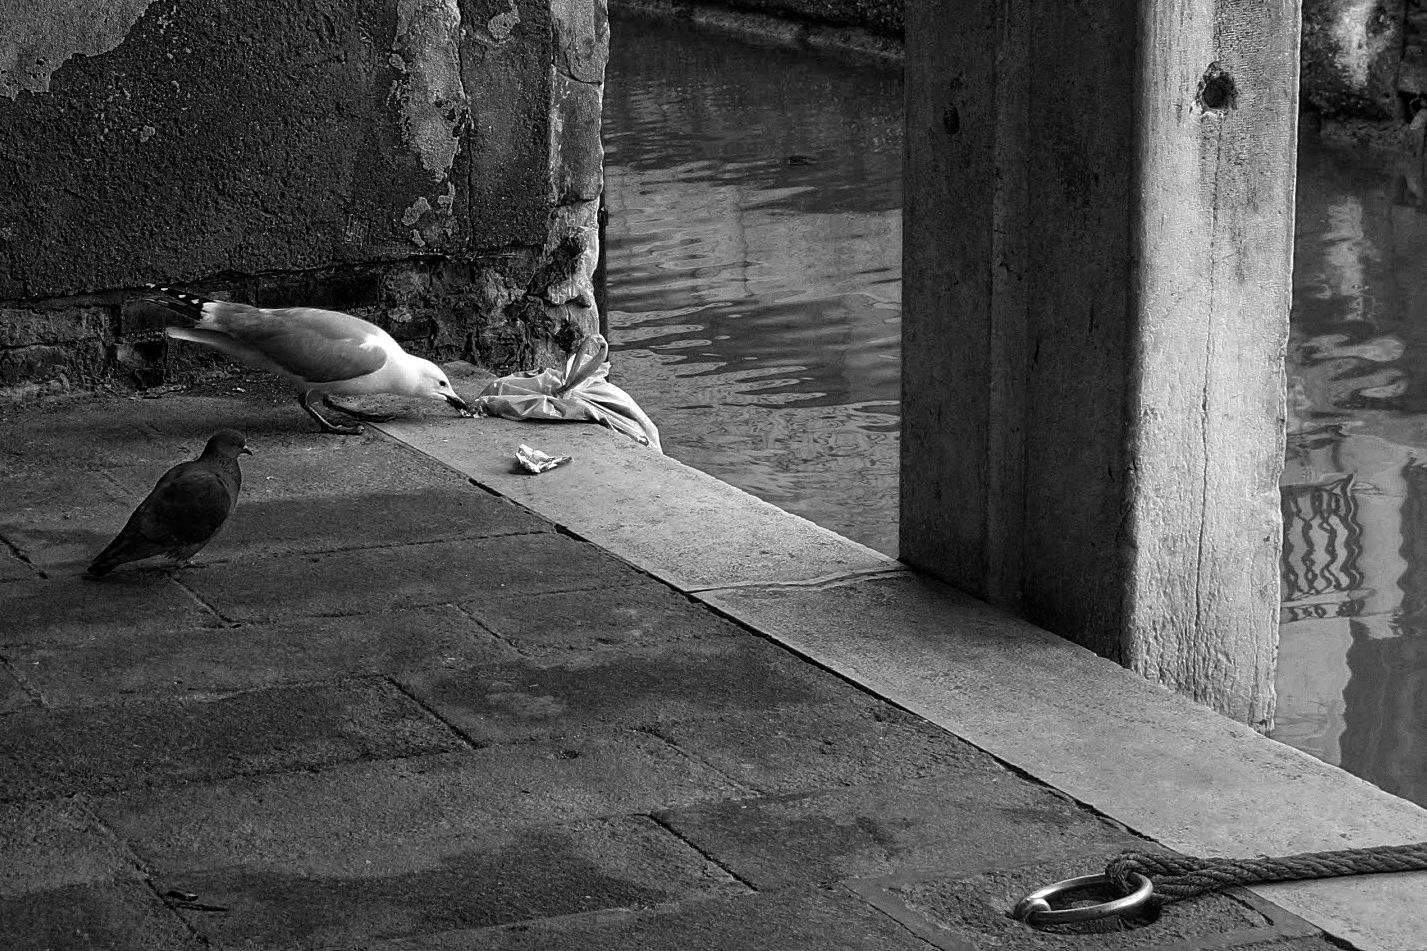 Waiting his turn by Sergio Deggiovanni